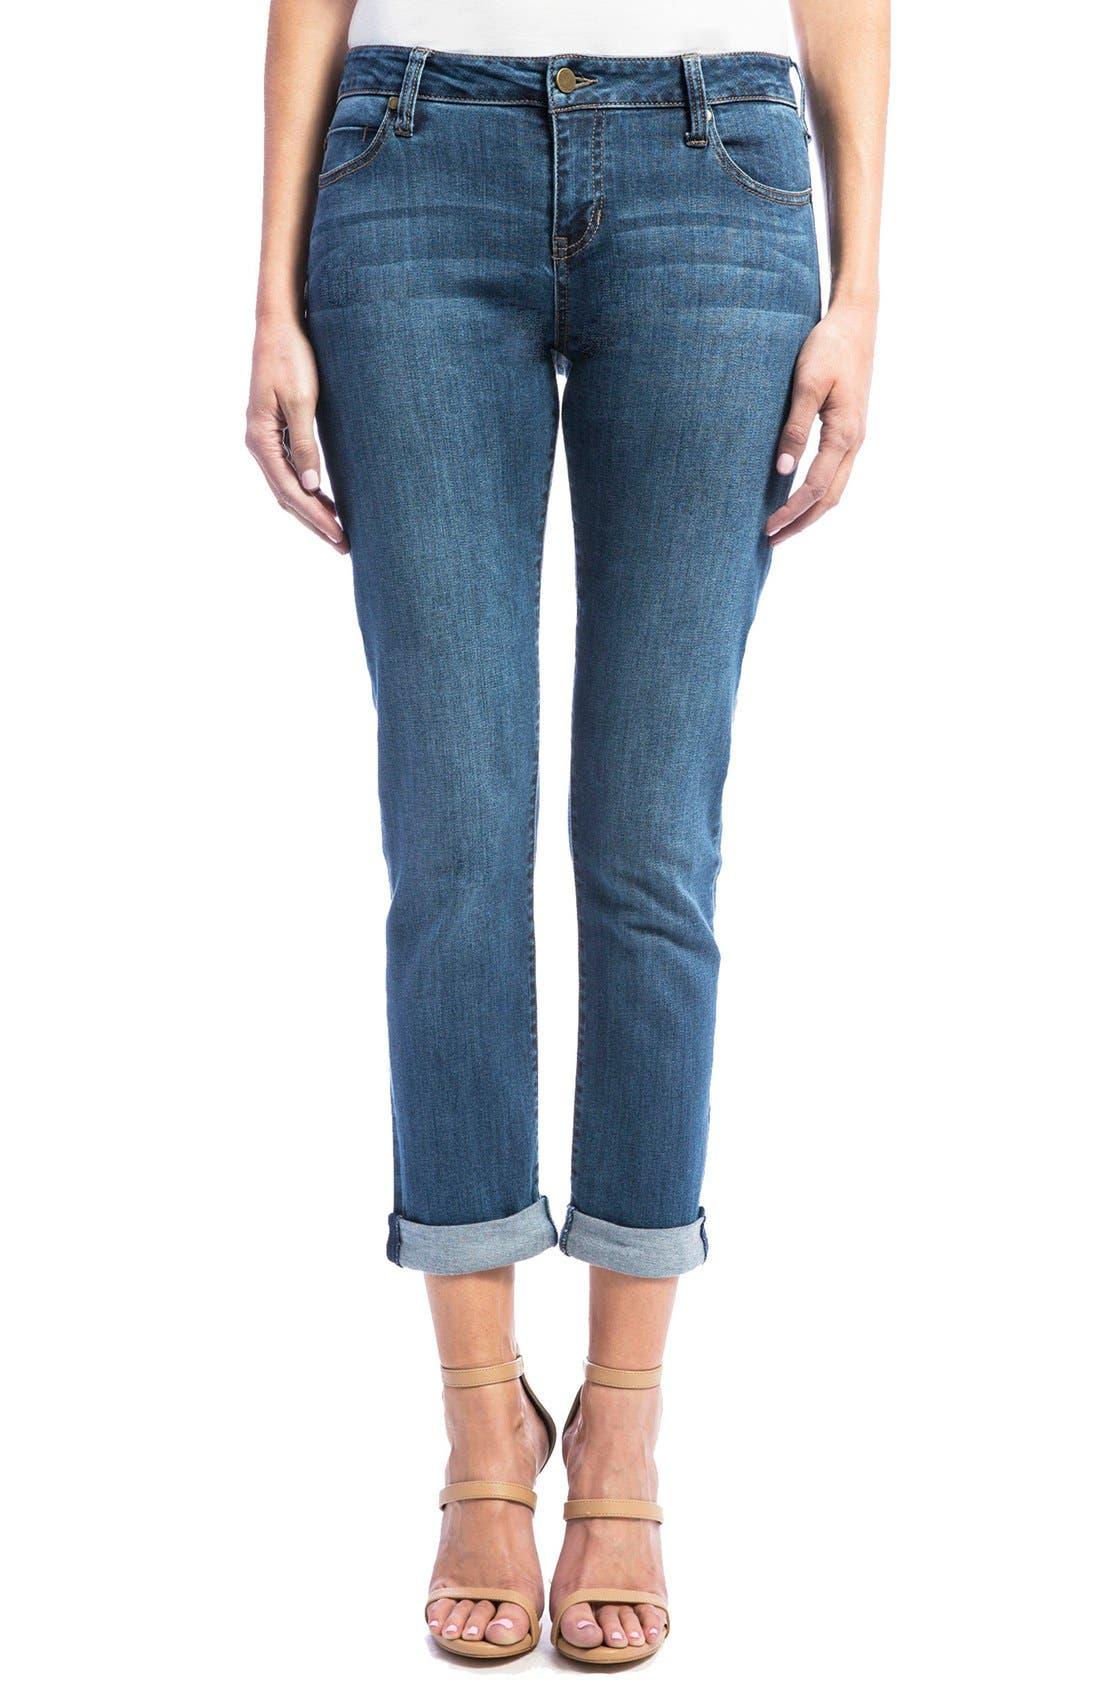 Main Image - Liverpool Jeans Company Peyton Slim Stretch Crop Boyfriend Jeans (Montauk)